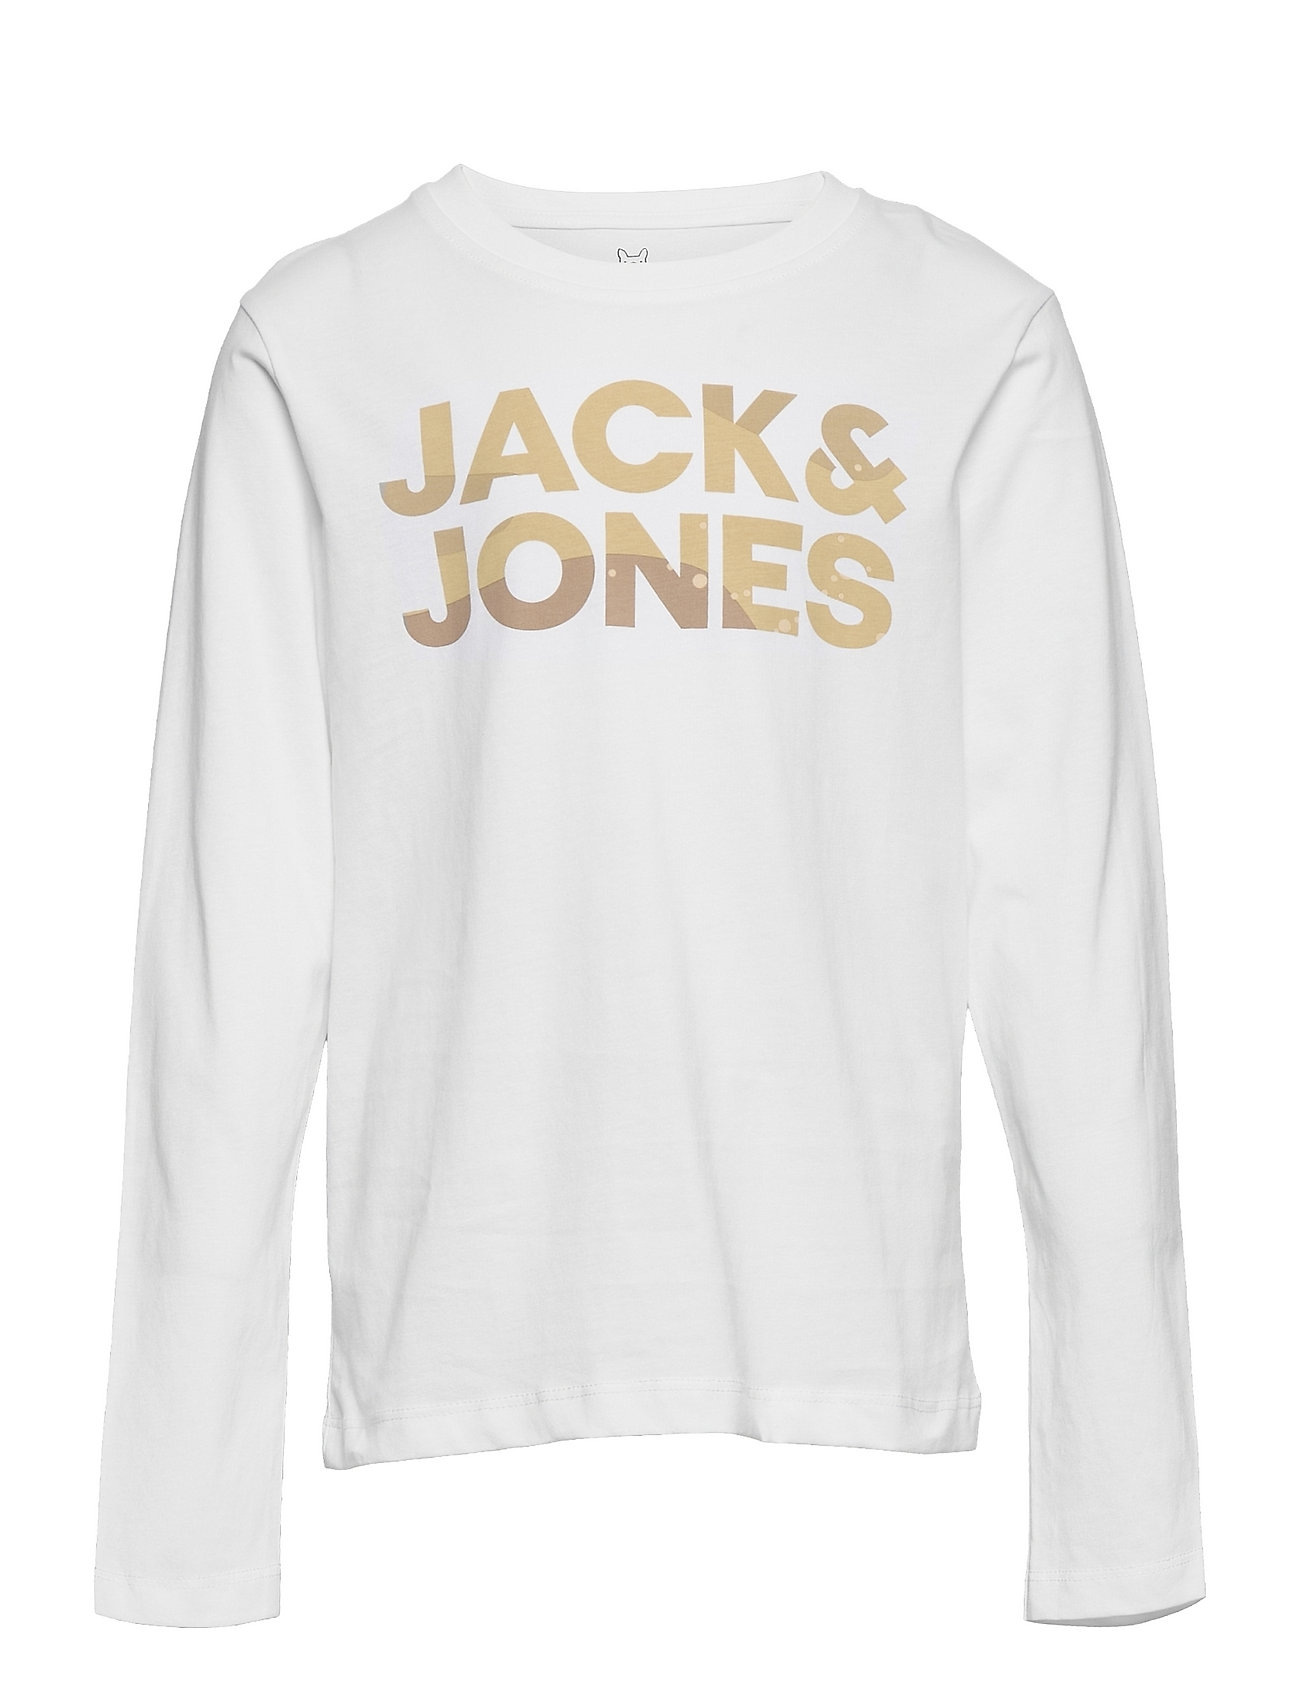 Jcodolan Tee Ls Crew Neck Jr Langærmet T-shirt Hvid Jack & J S